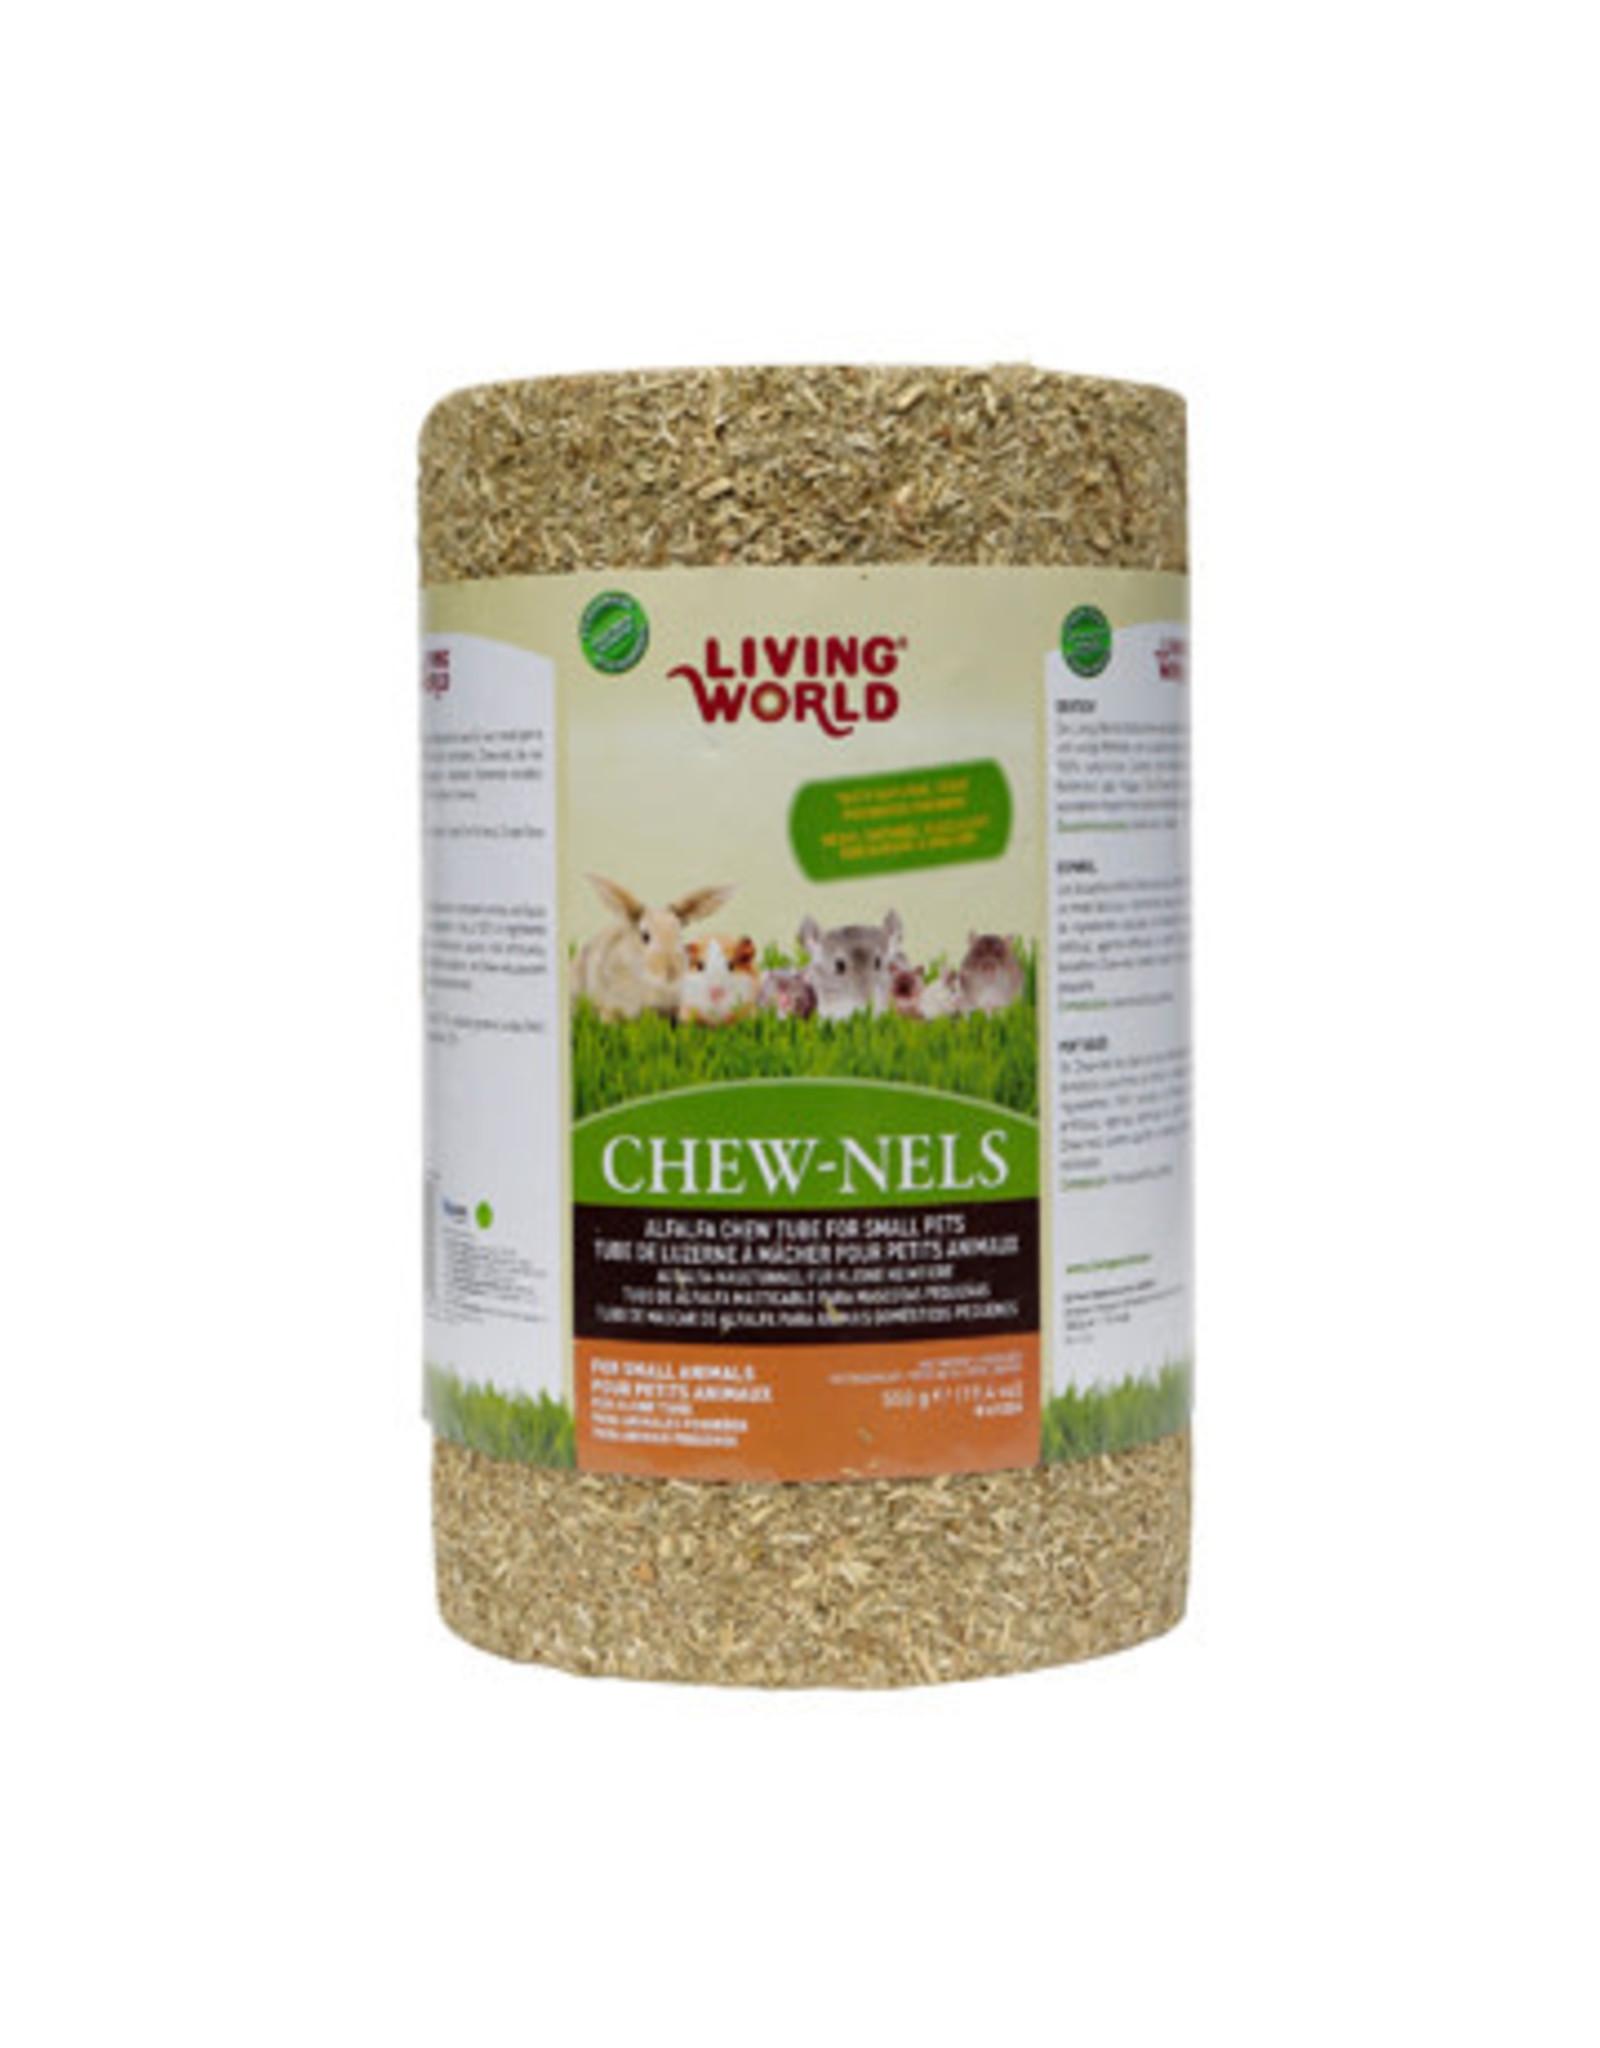 Living World Living World Alfalfa Chew-nels - Large